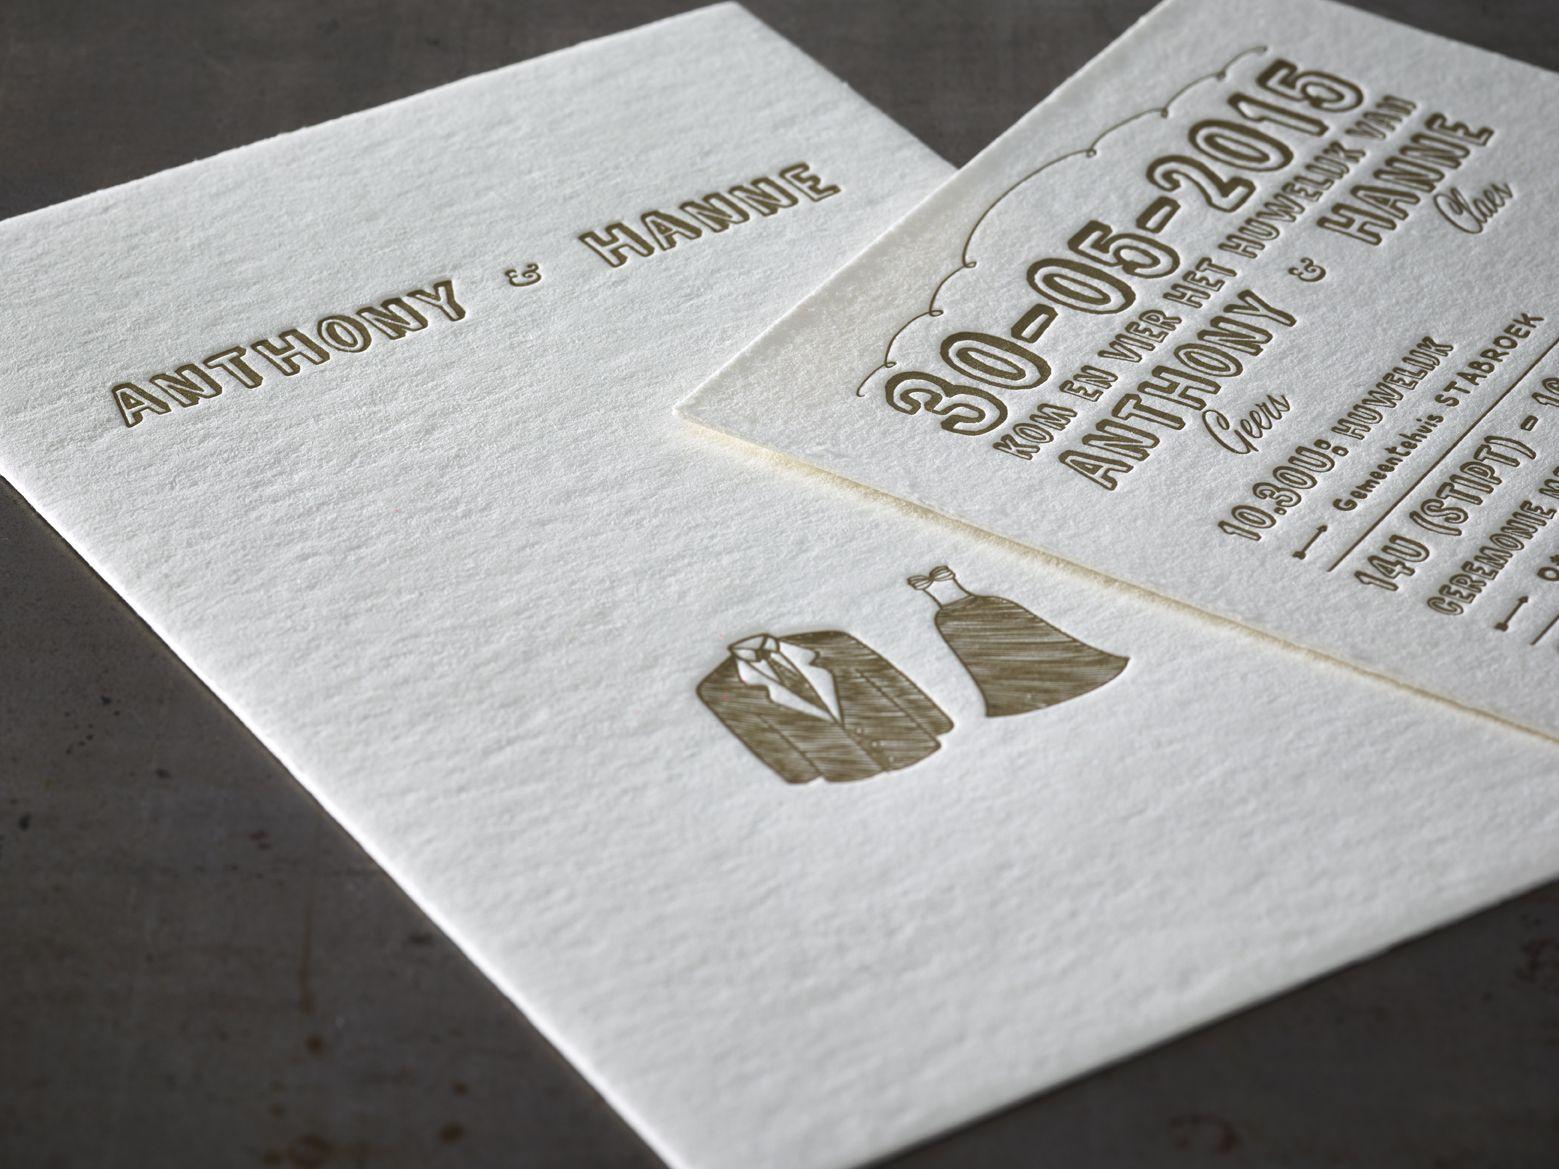 Wedding invitation ah letterpress printing on macho mick paper wedding invitation ah letterpress printing on macho mick paper proudly printed in belgium by www junglespirit Gallery